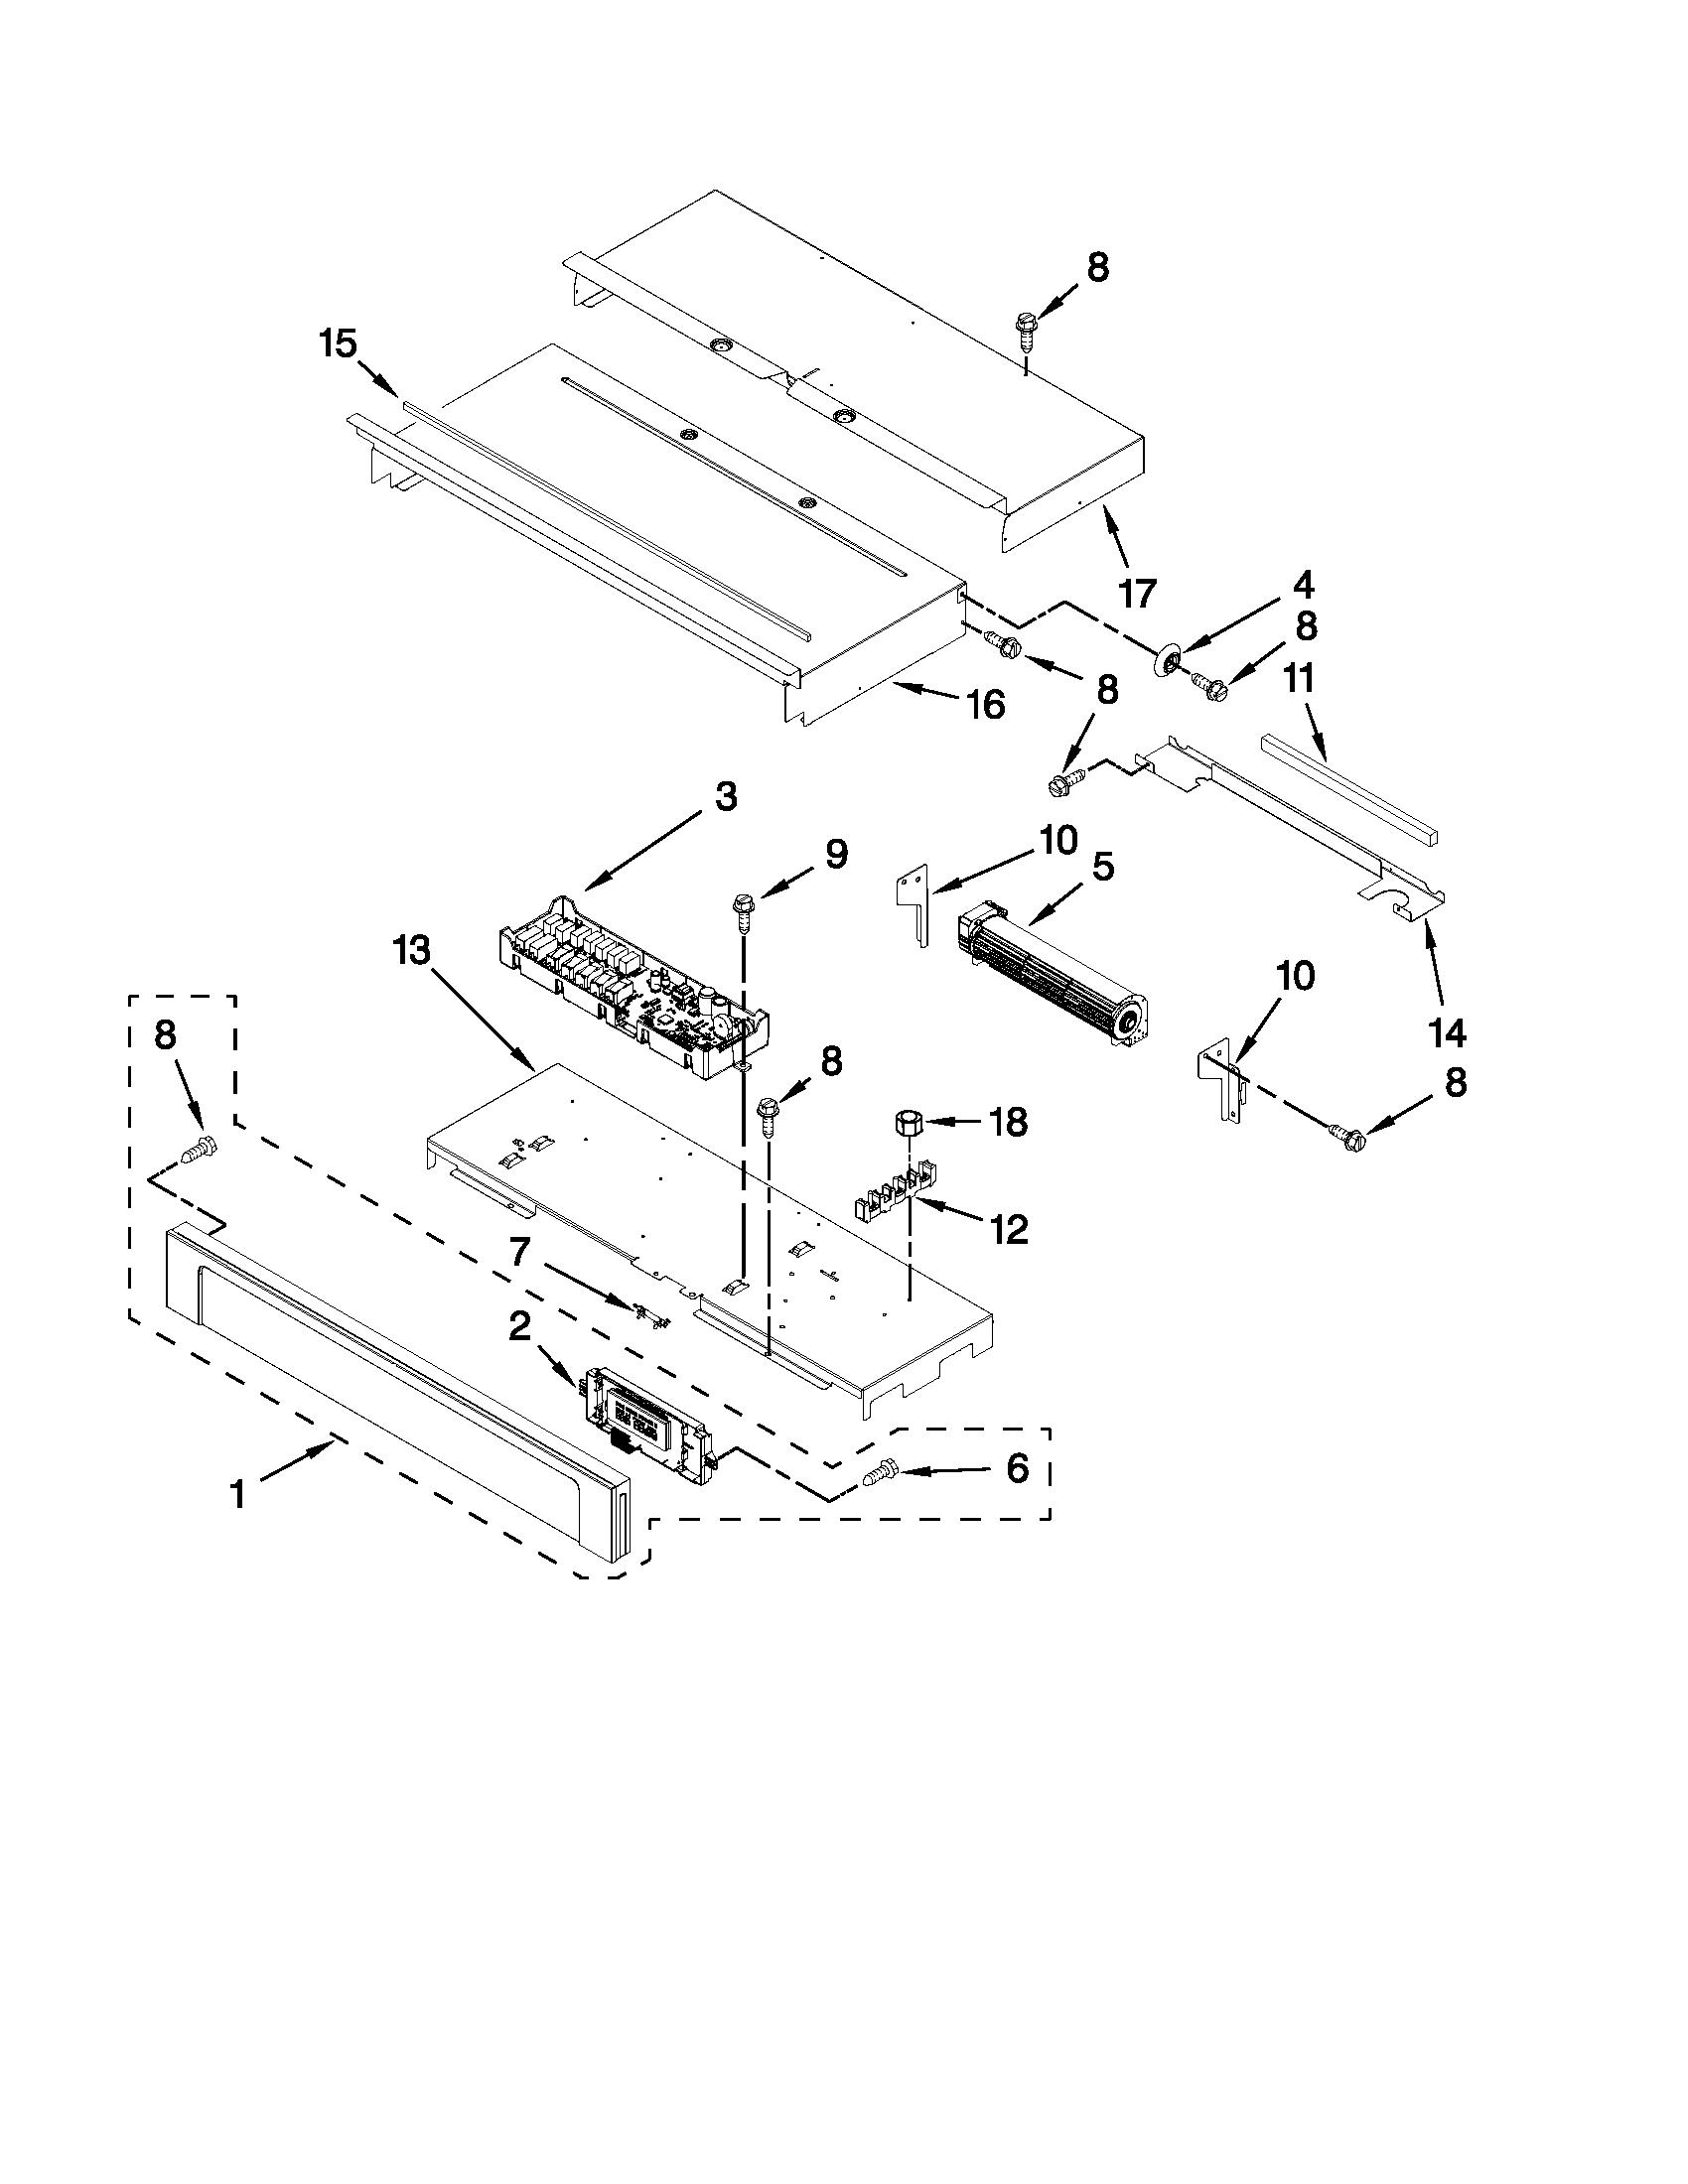 CONTROL PANEL PARTS Diagram & Parts List for Model